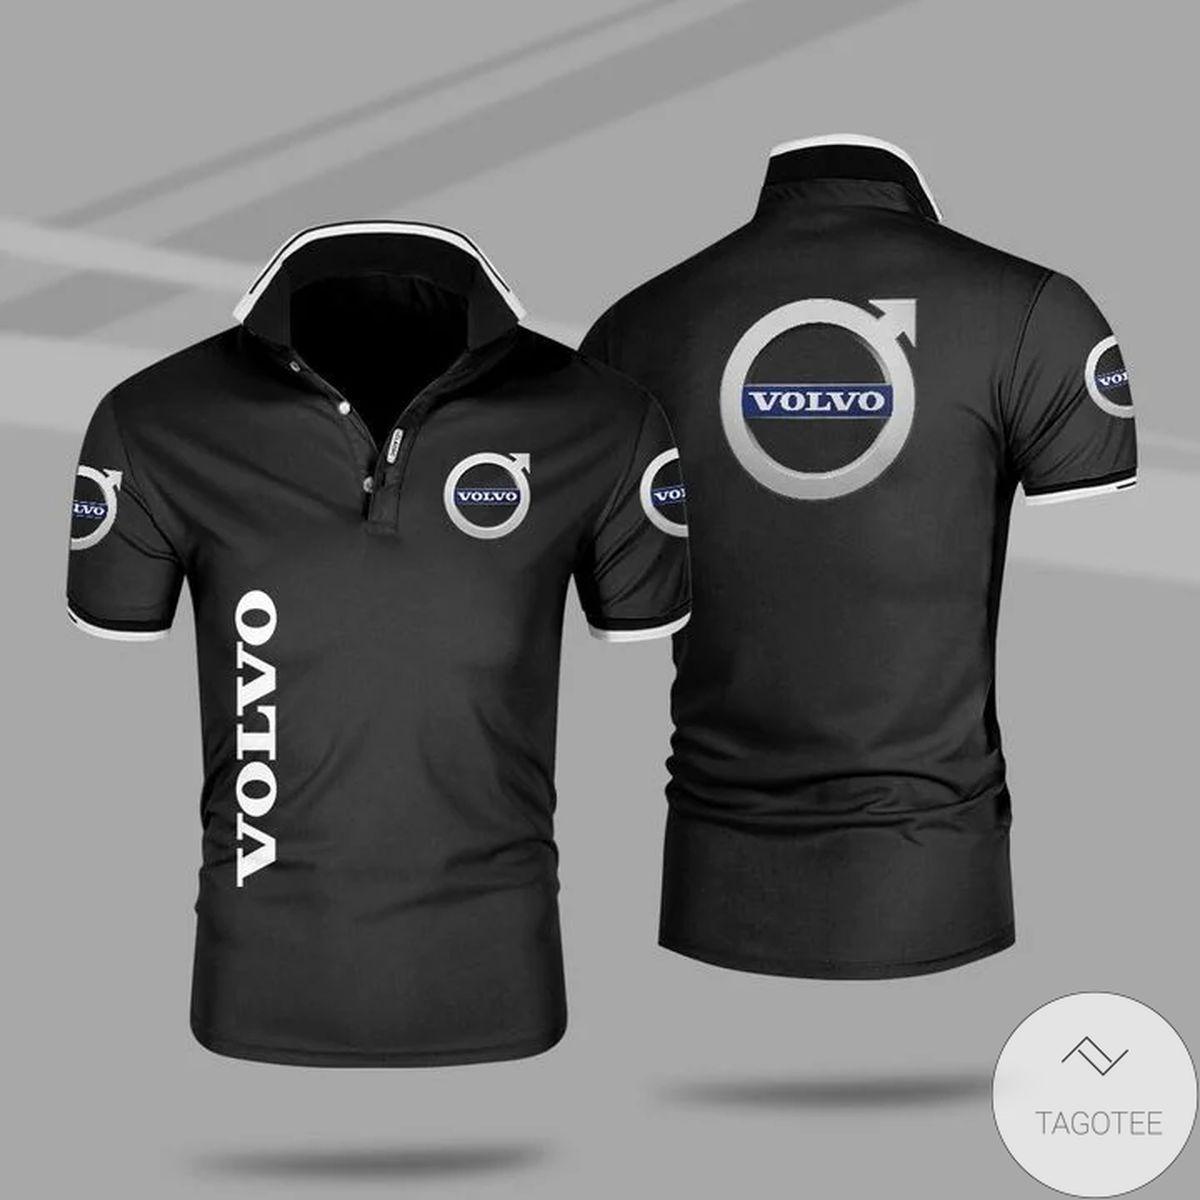 Volvo Polo Shirt